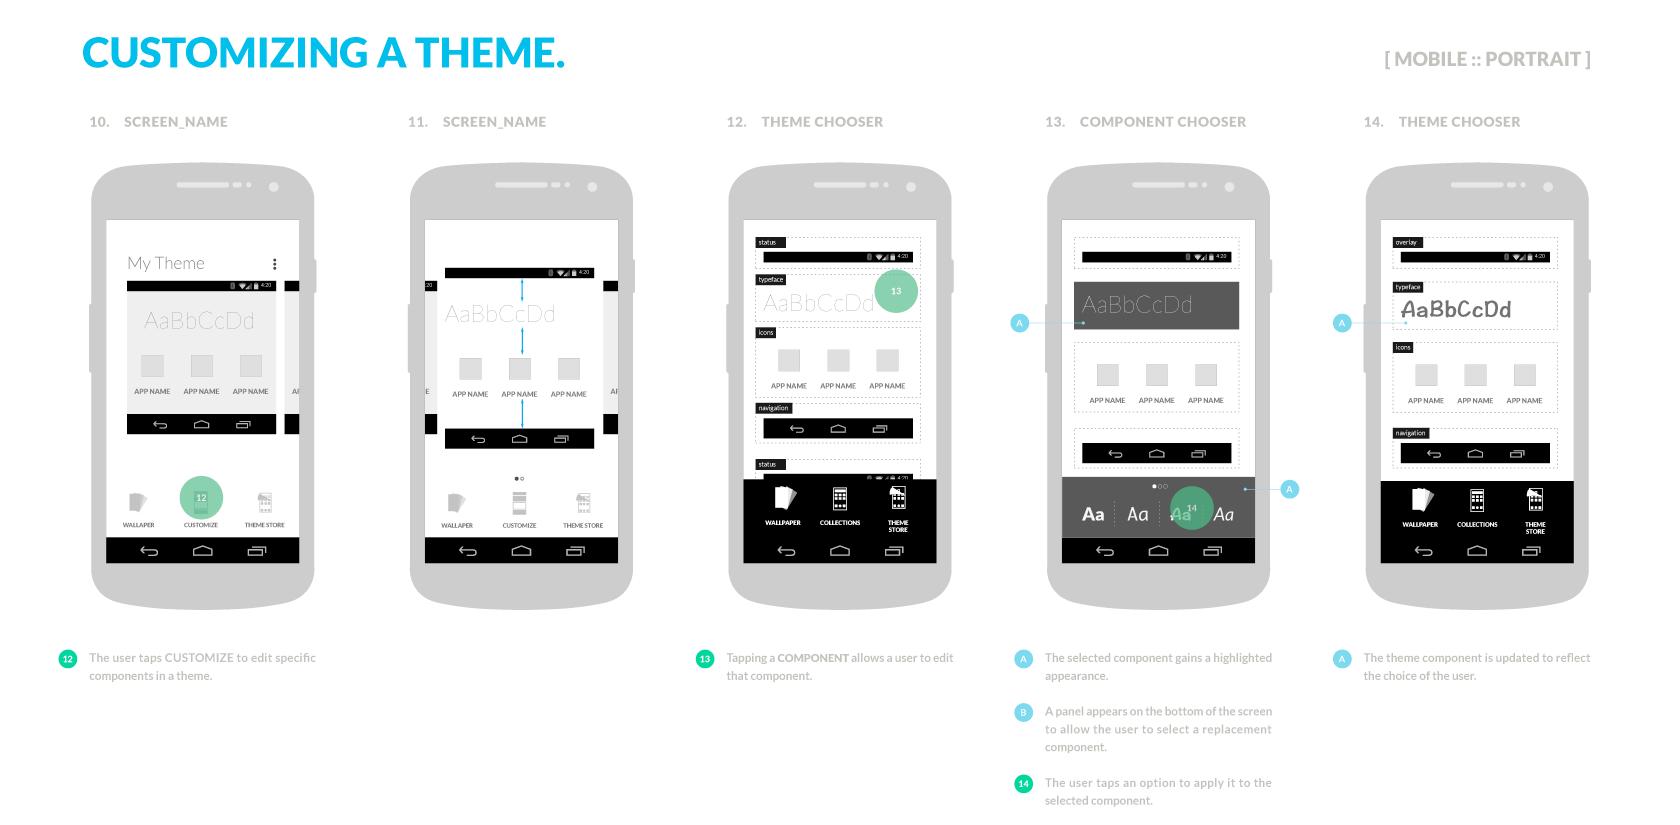 Theme chooser UX sample (by teammate Adrian Valencia)